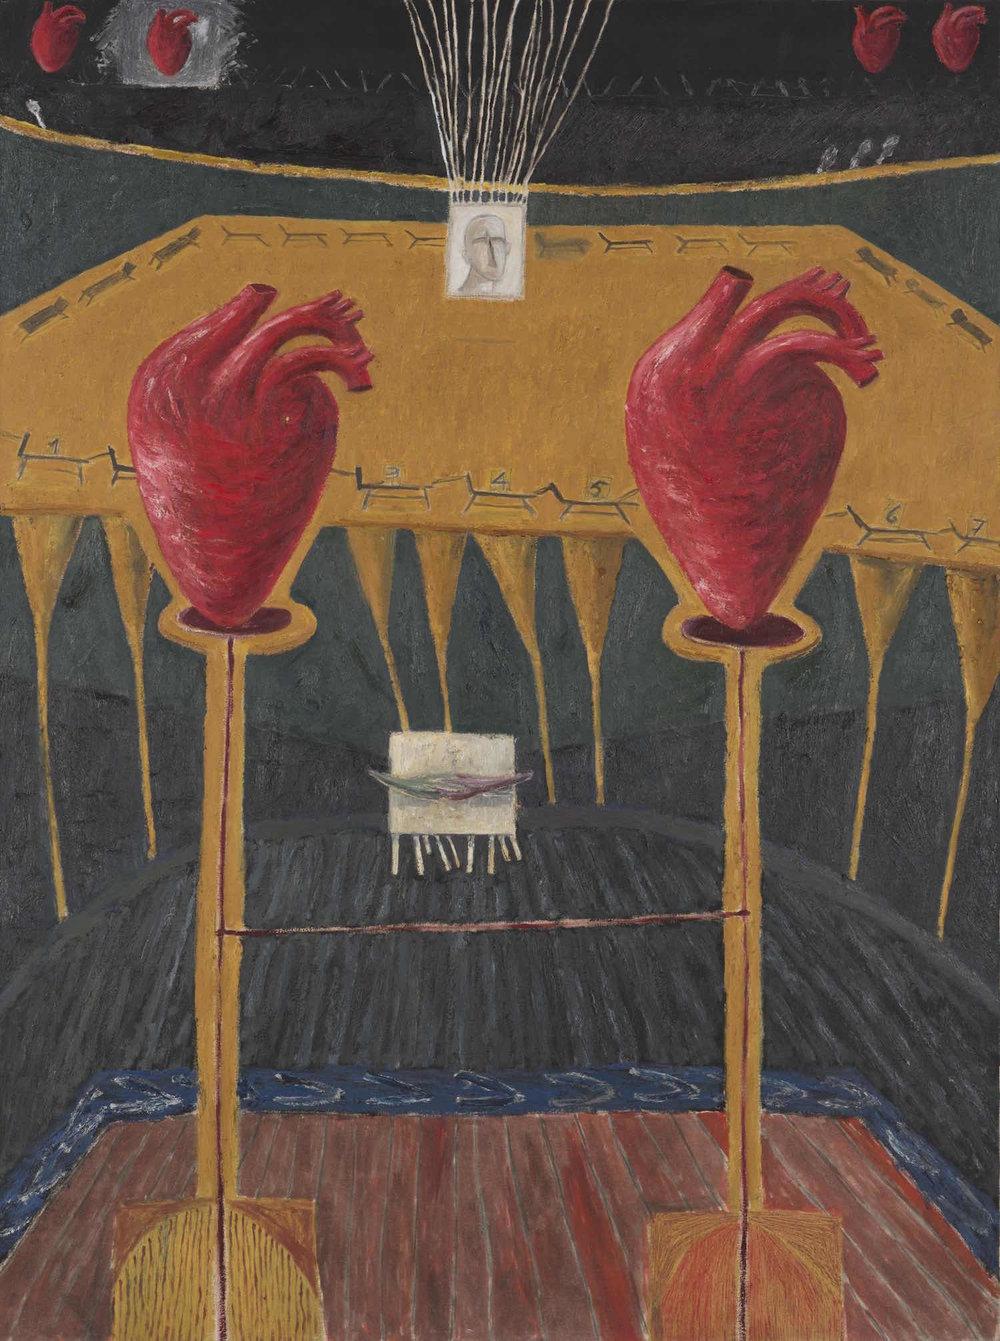 Amor del puro   Óleo sobre lienzo        160 x 120 cm. 1990